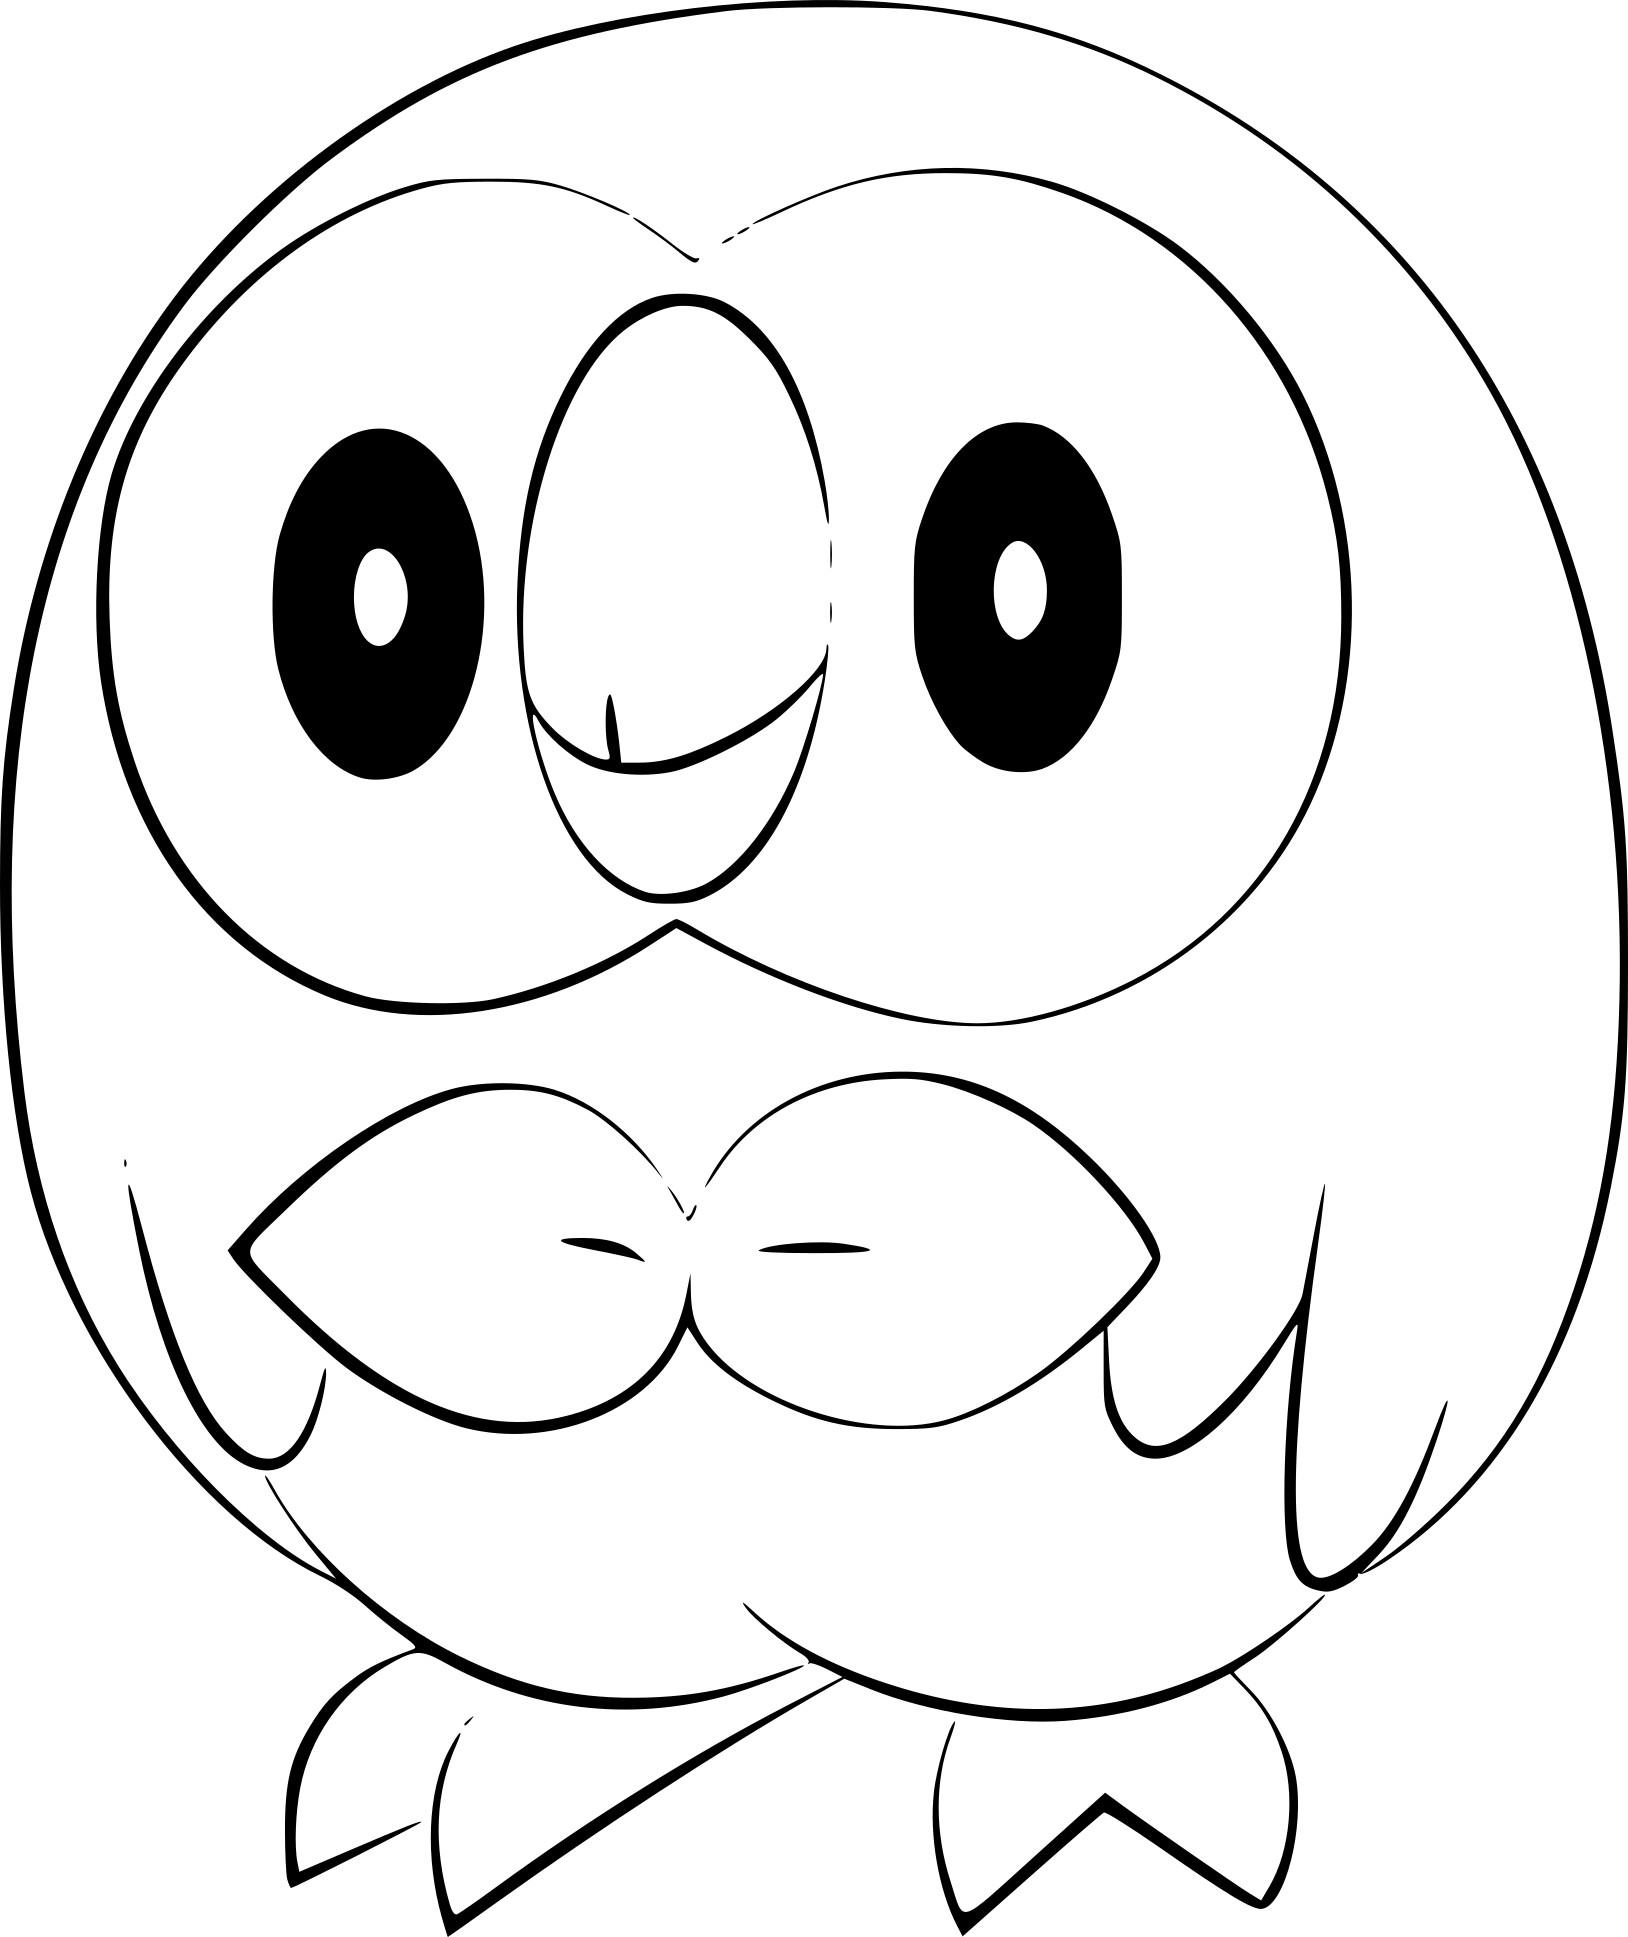 Coloriage brindibou pokemon imprimer - Image de pokemon a imprimer ...